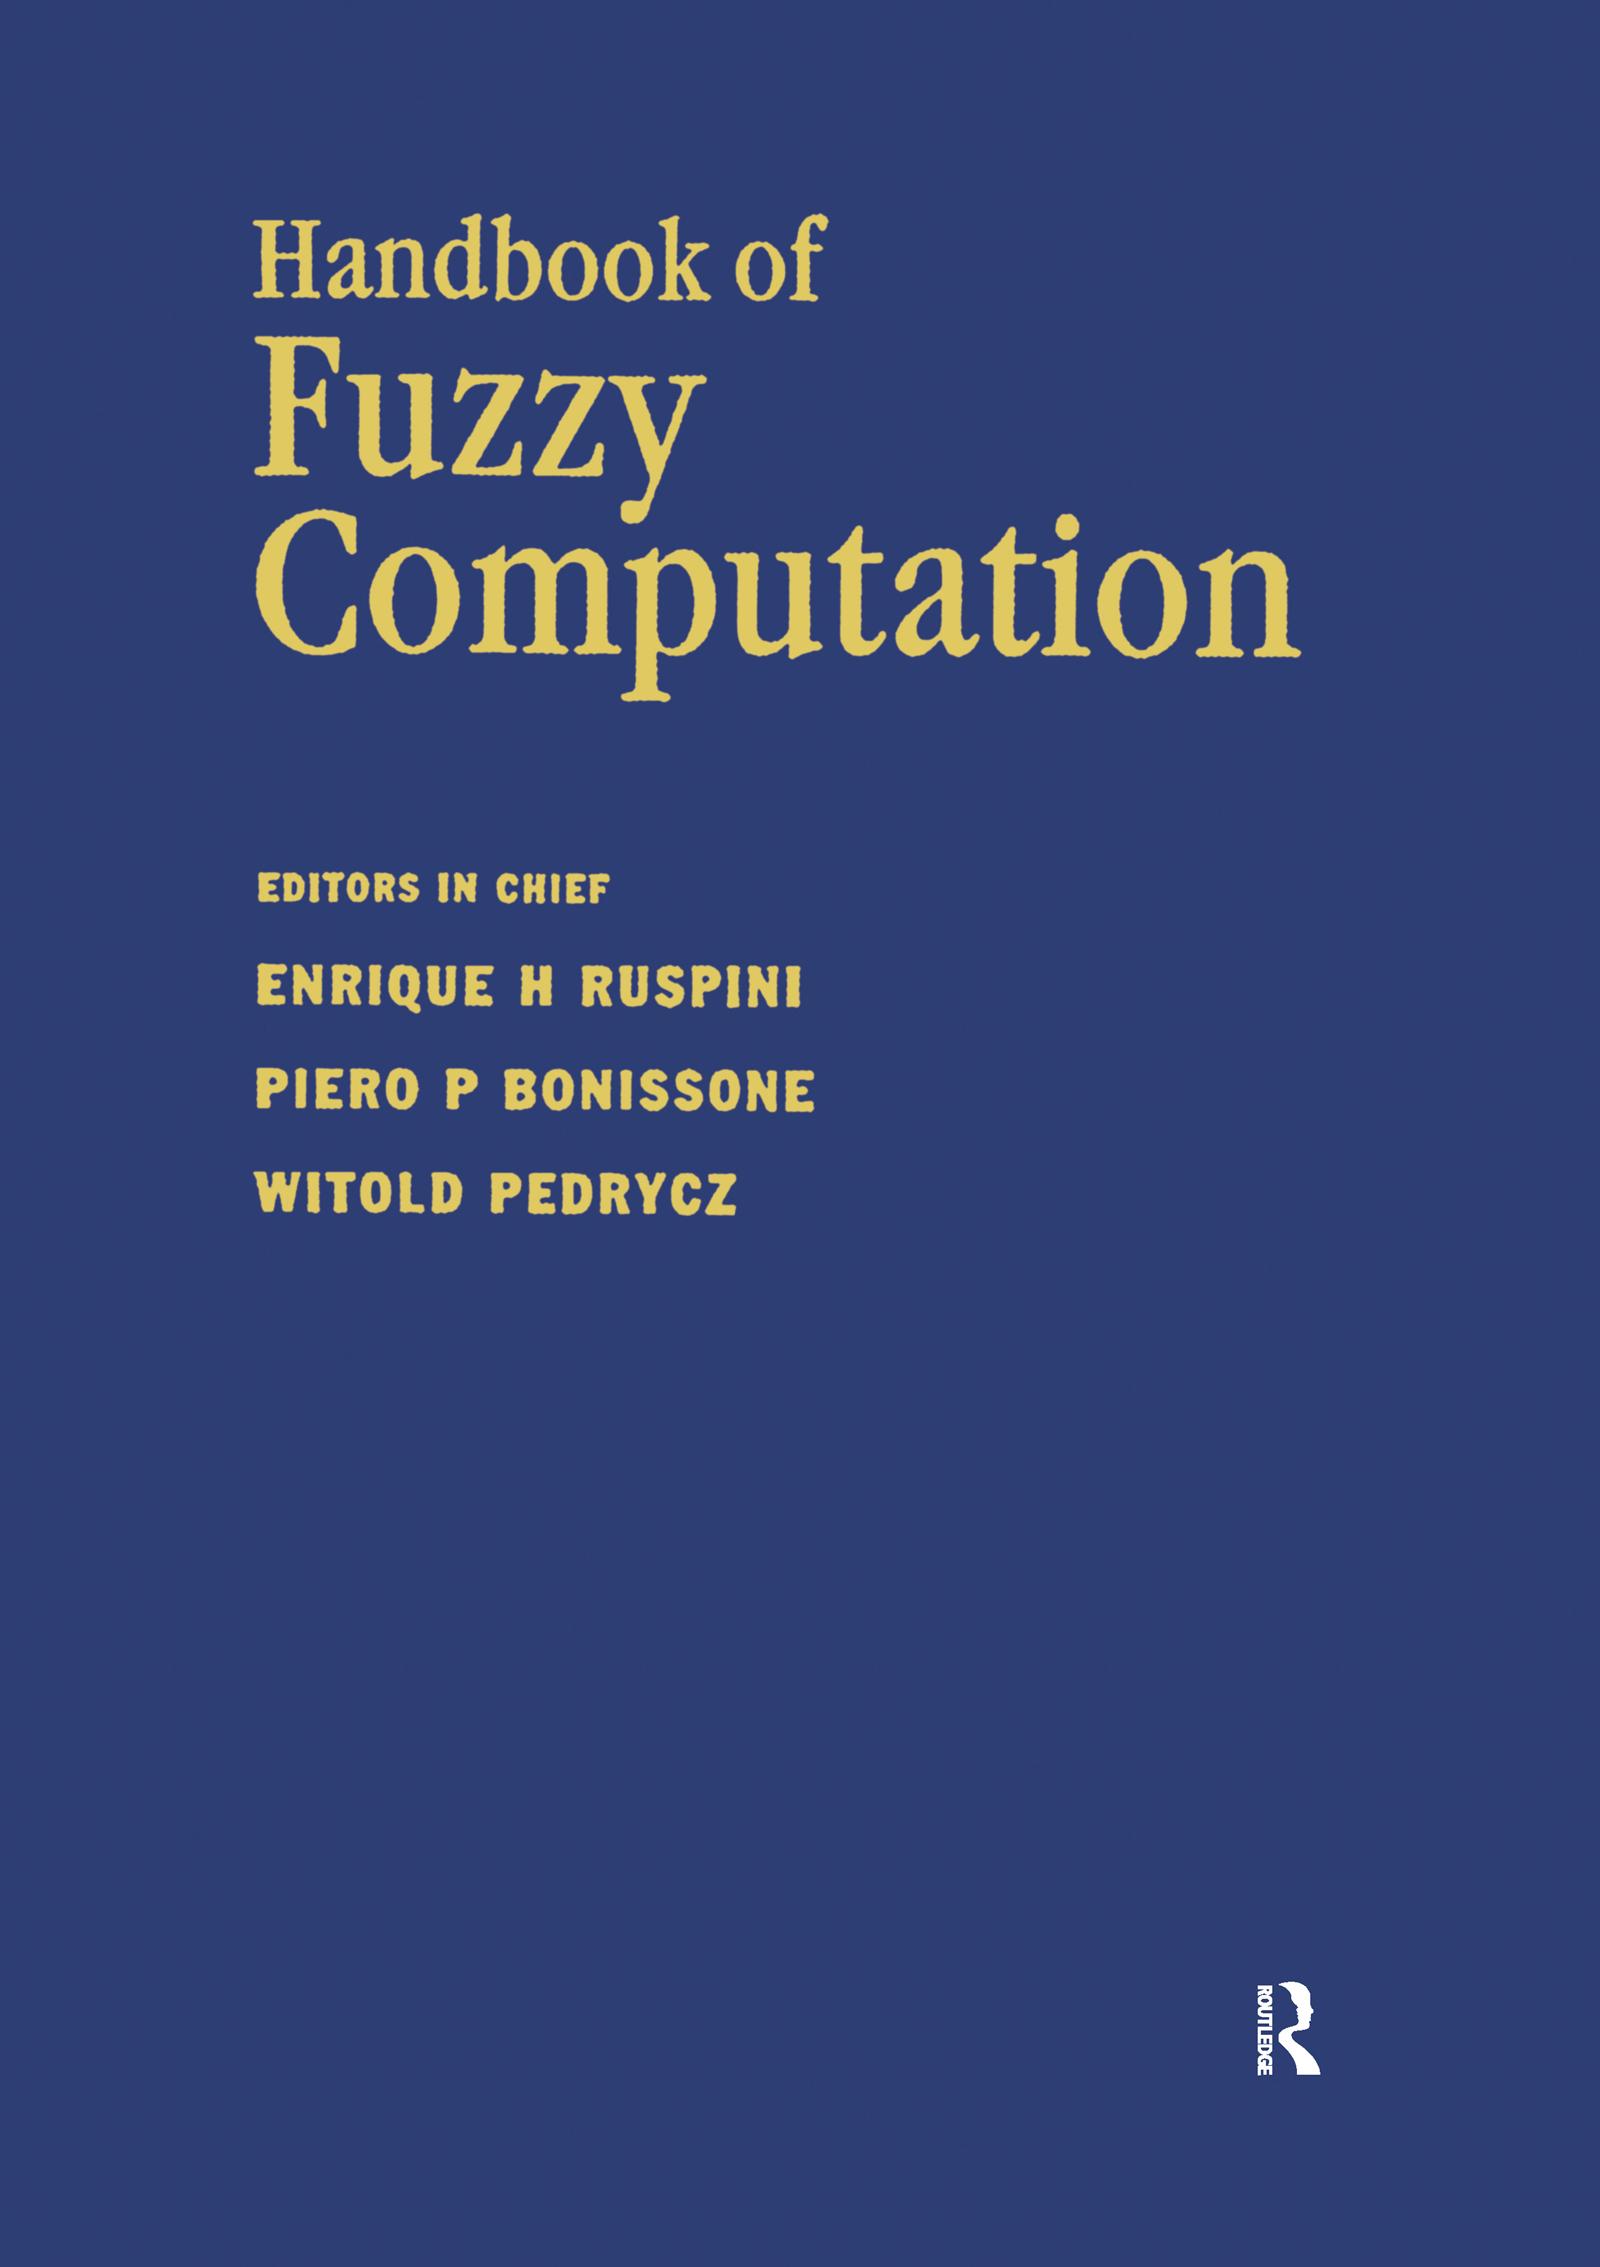 Handbook of Fuzzy Computation: 1st Edition (Hardback) book cover